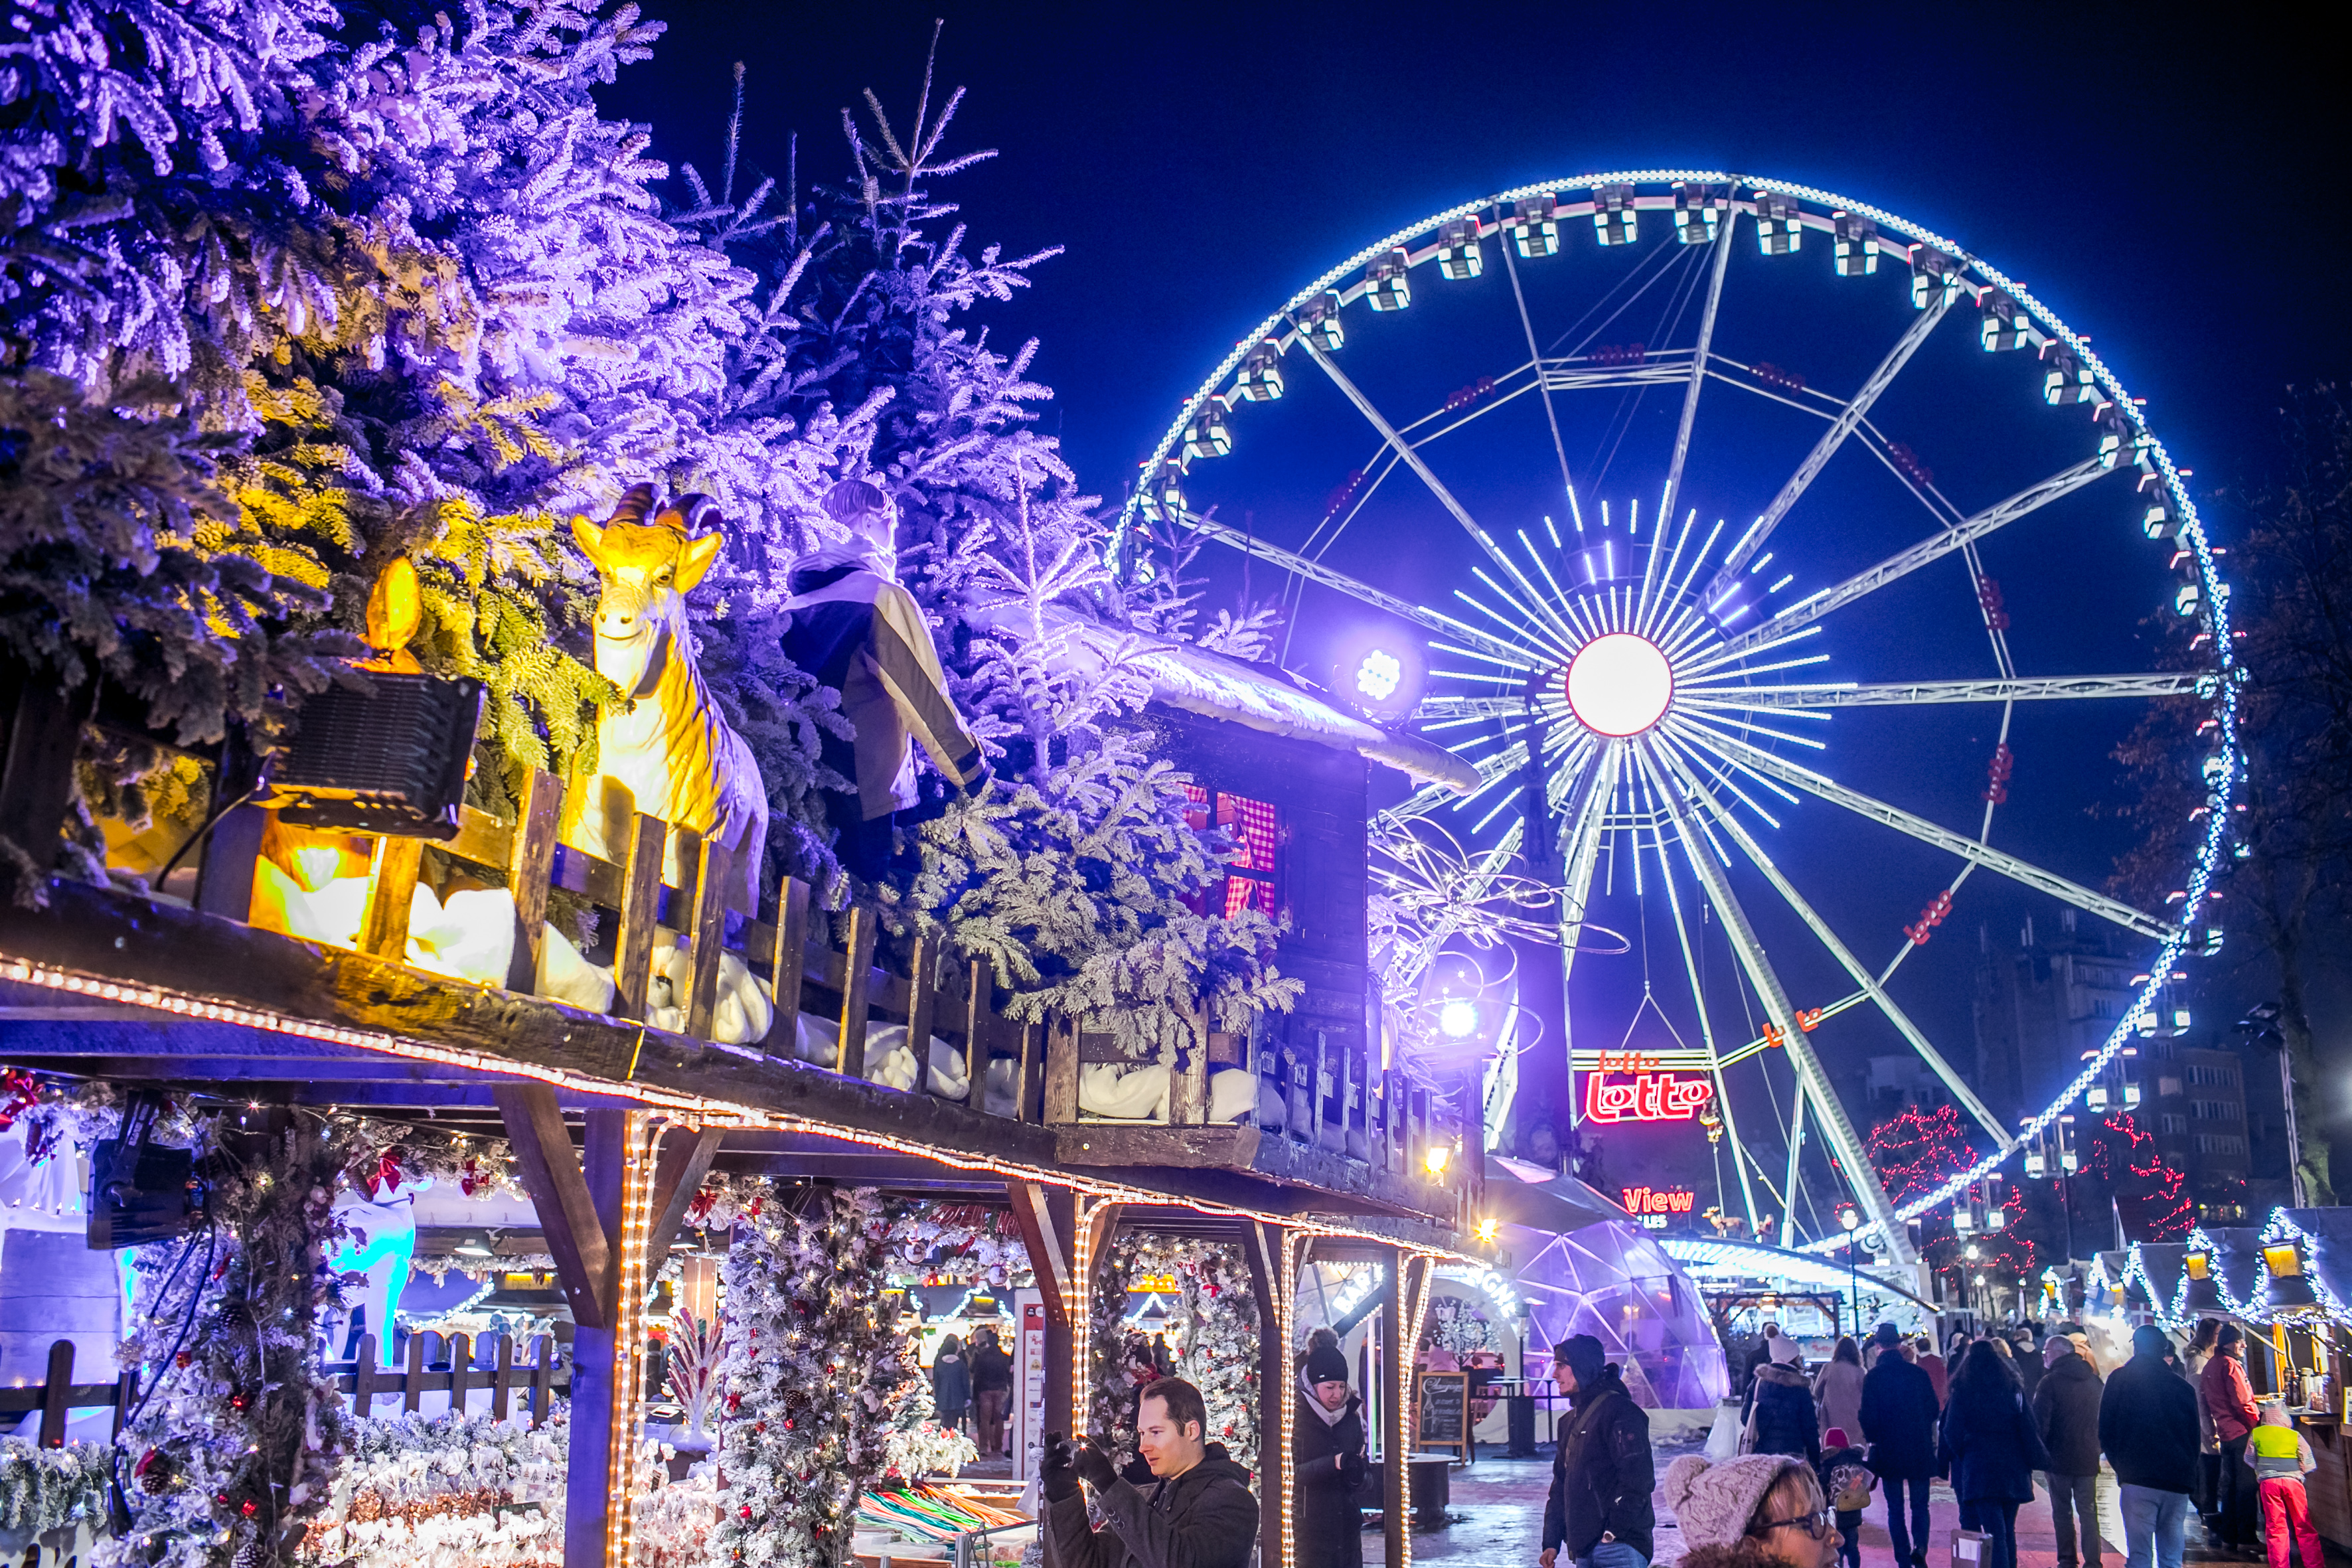 Brussels Plaisirs d'Hiver - Winterpret - Winter Wonders_EDAN0296_© visit.brussels - Eric Danhier